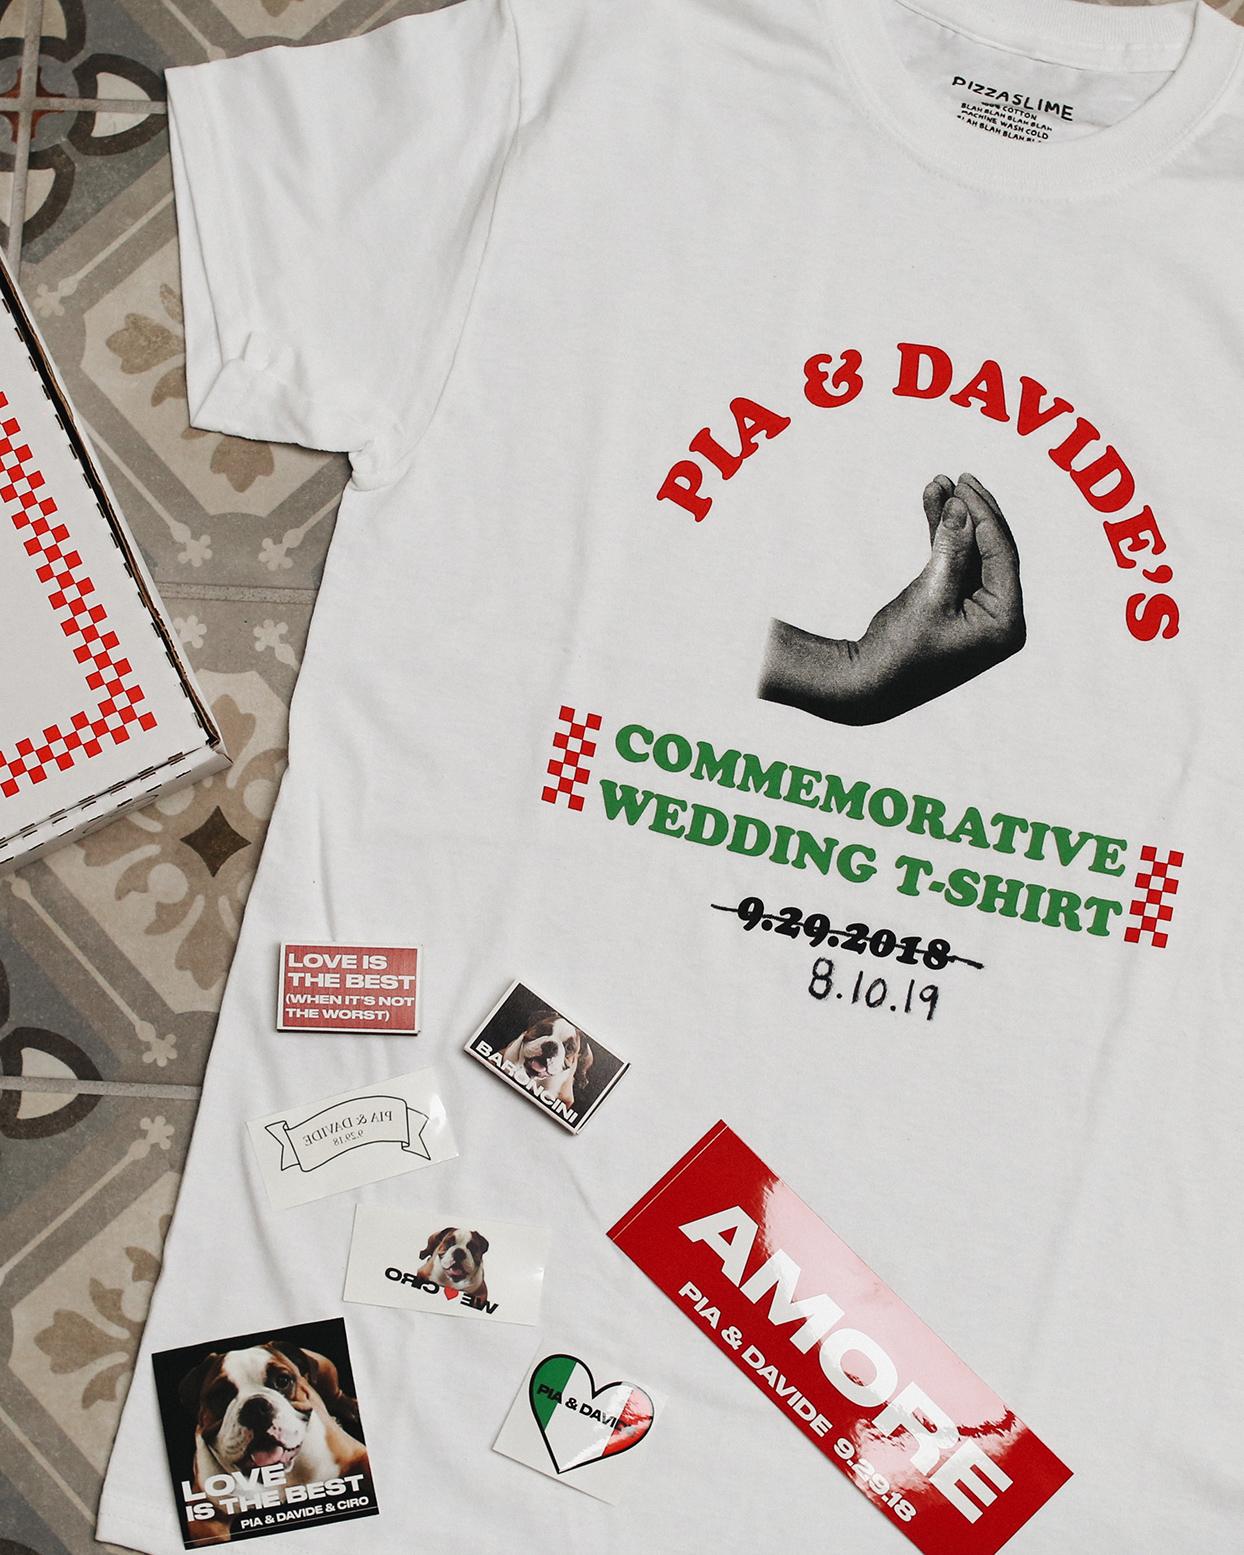 pia davide commemorative wedding shirt and favors